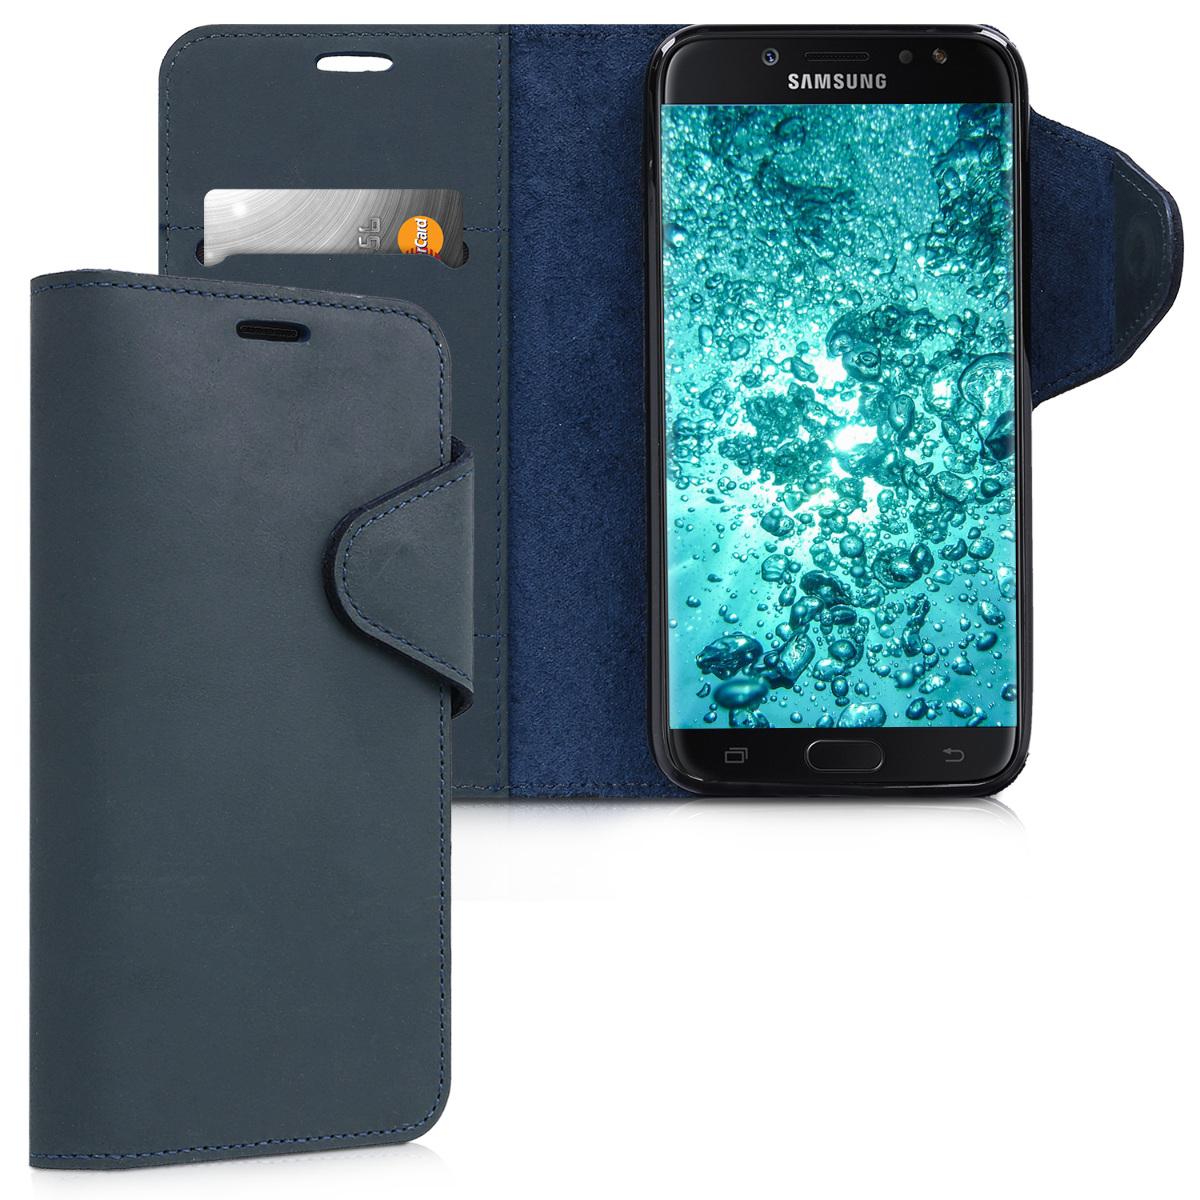 Kalibri Δερμάτινη Suede Θήκη - Πορτοφόλι  Samsung Galaxy J7 (2017) -  Dark Blue (42897.17)